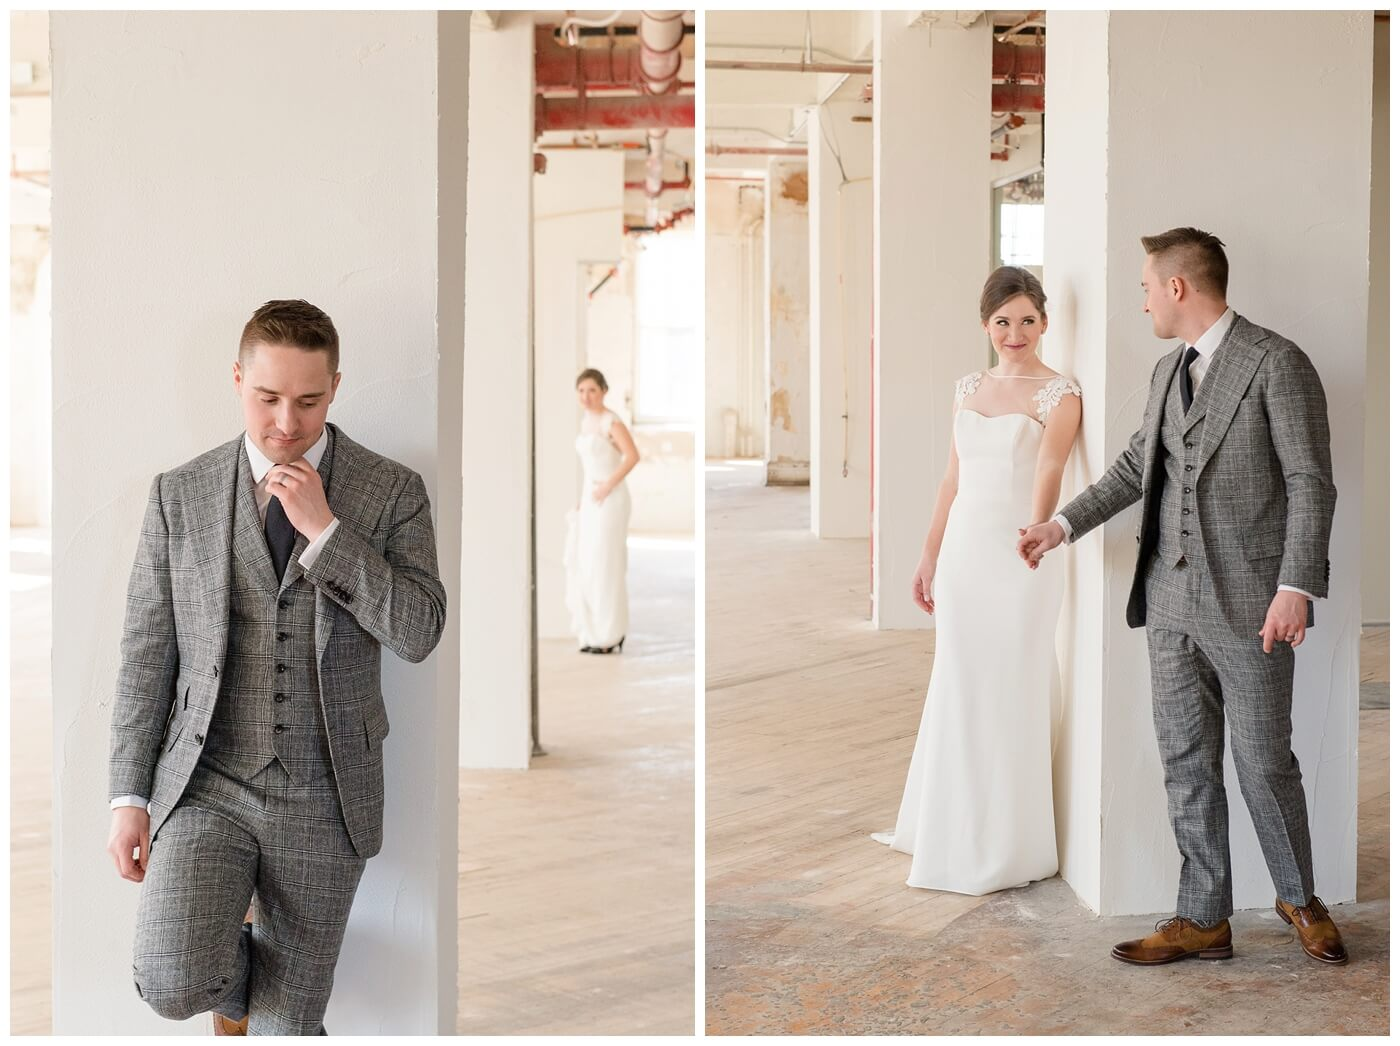 Mark & Kyra - Wedding - 10 - Mark & Kyra - First Look in Weston Bakery